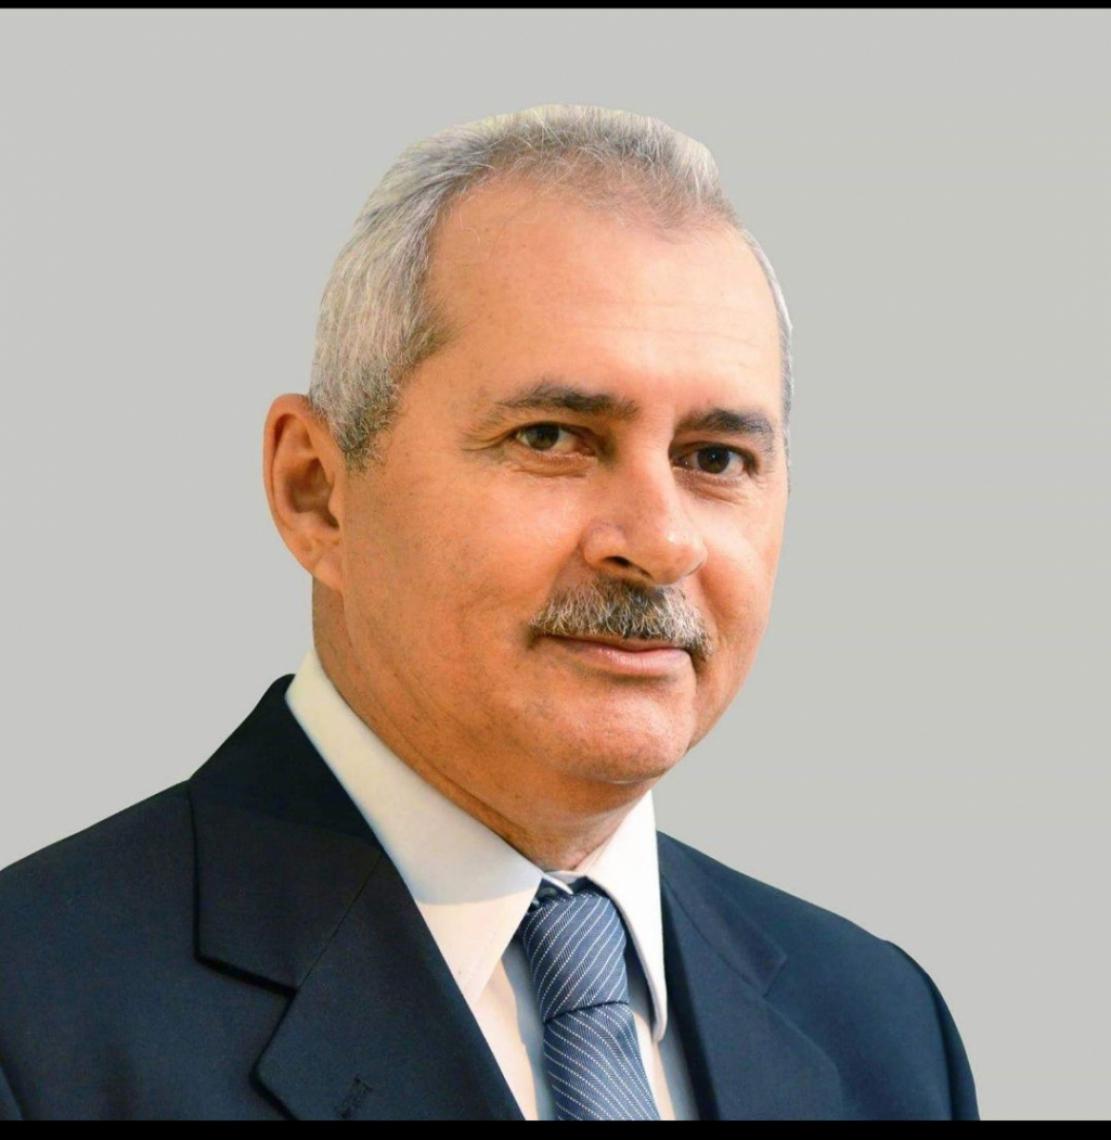 Wilton Daher Vice-presidente do Instituto Brasileiro de Executivos de Finanças do Ceará (Ibef-CE)